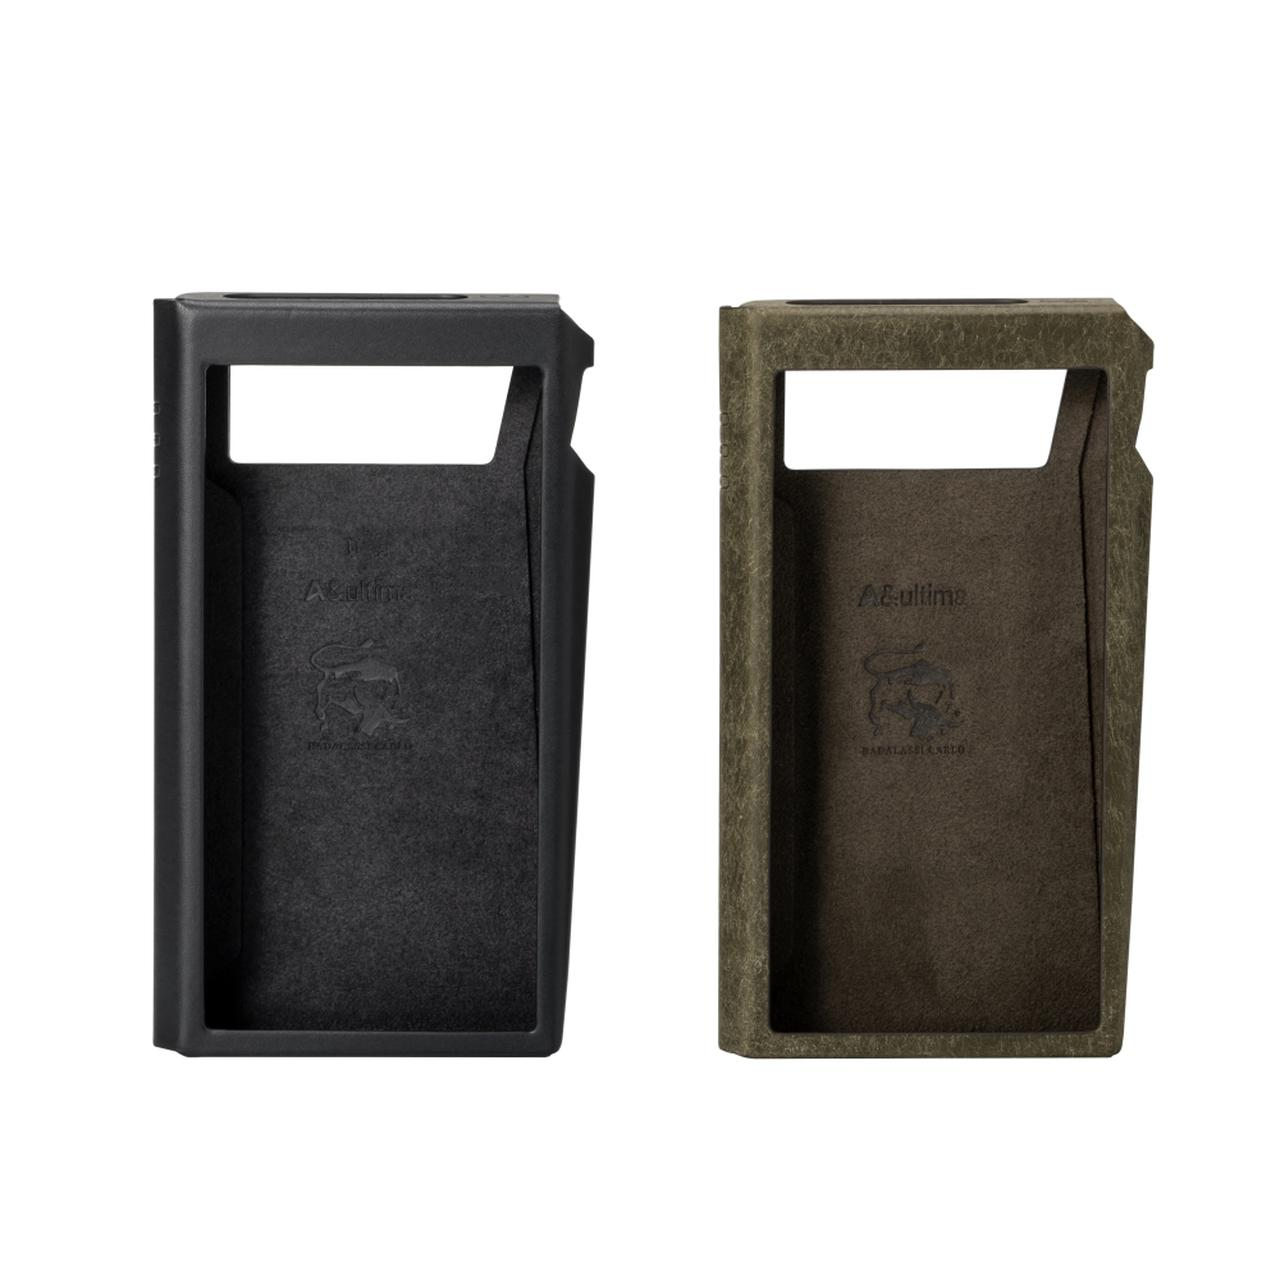 画像: A&ultima SP2000T Case|Astell&Kern